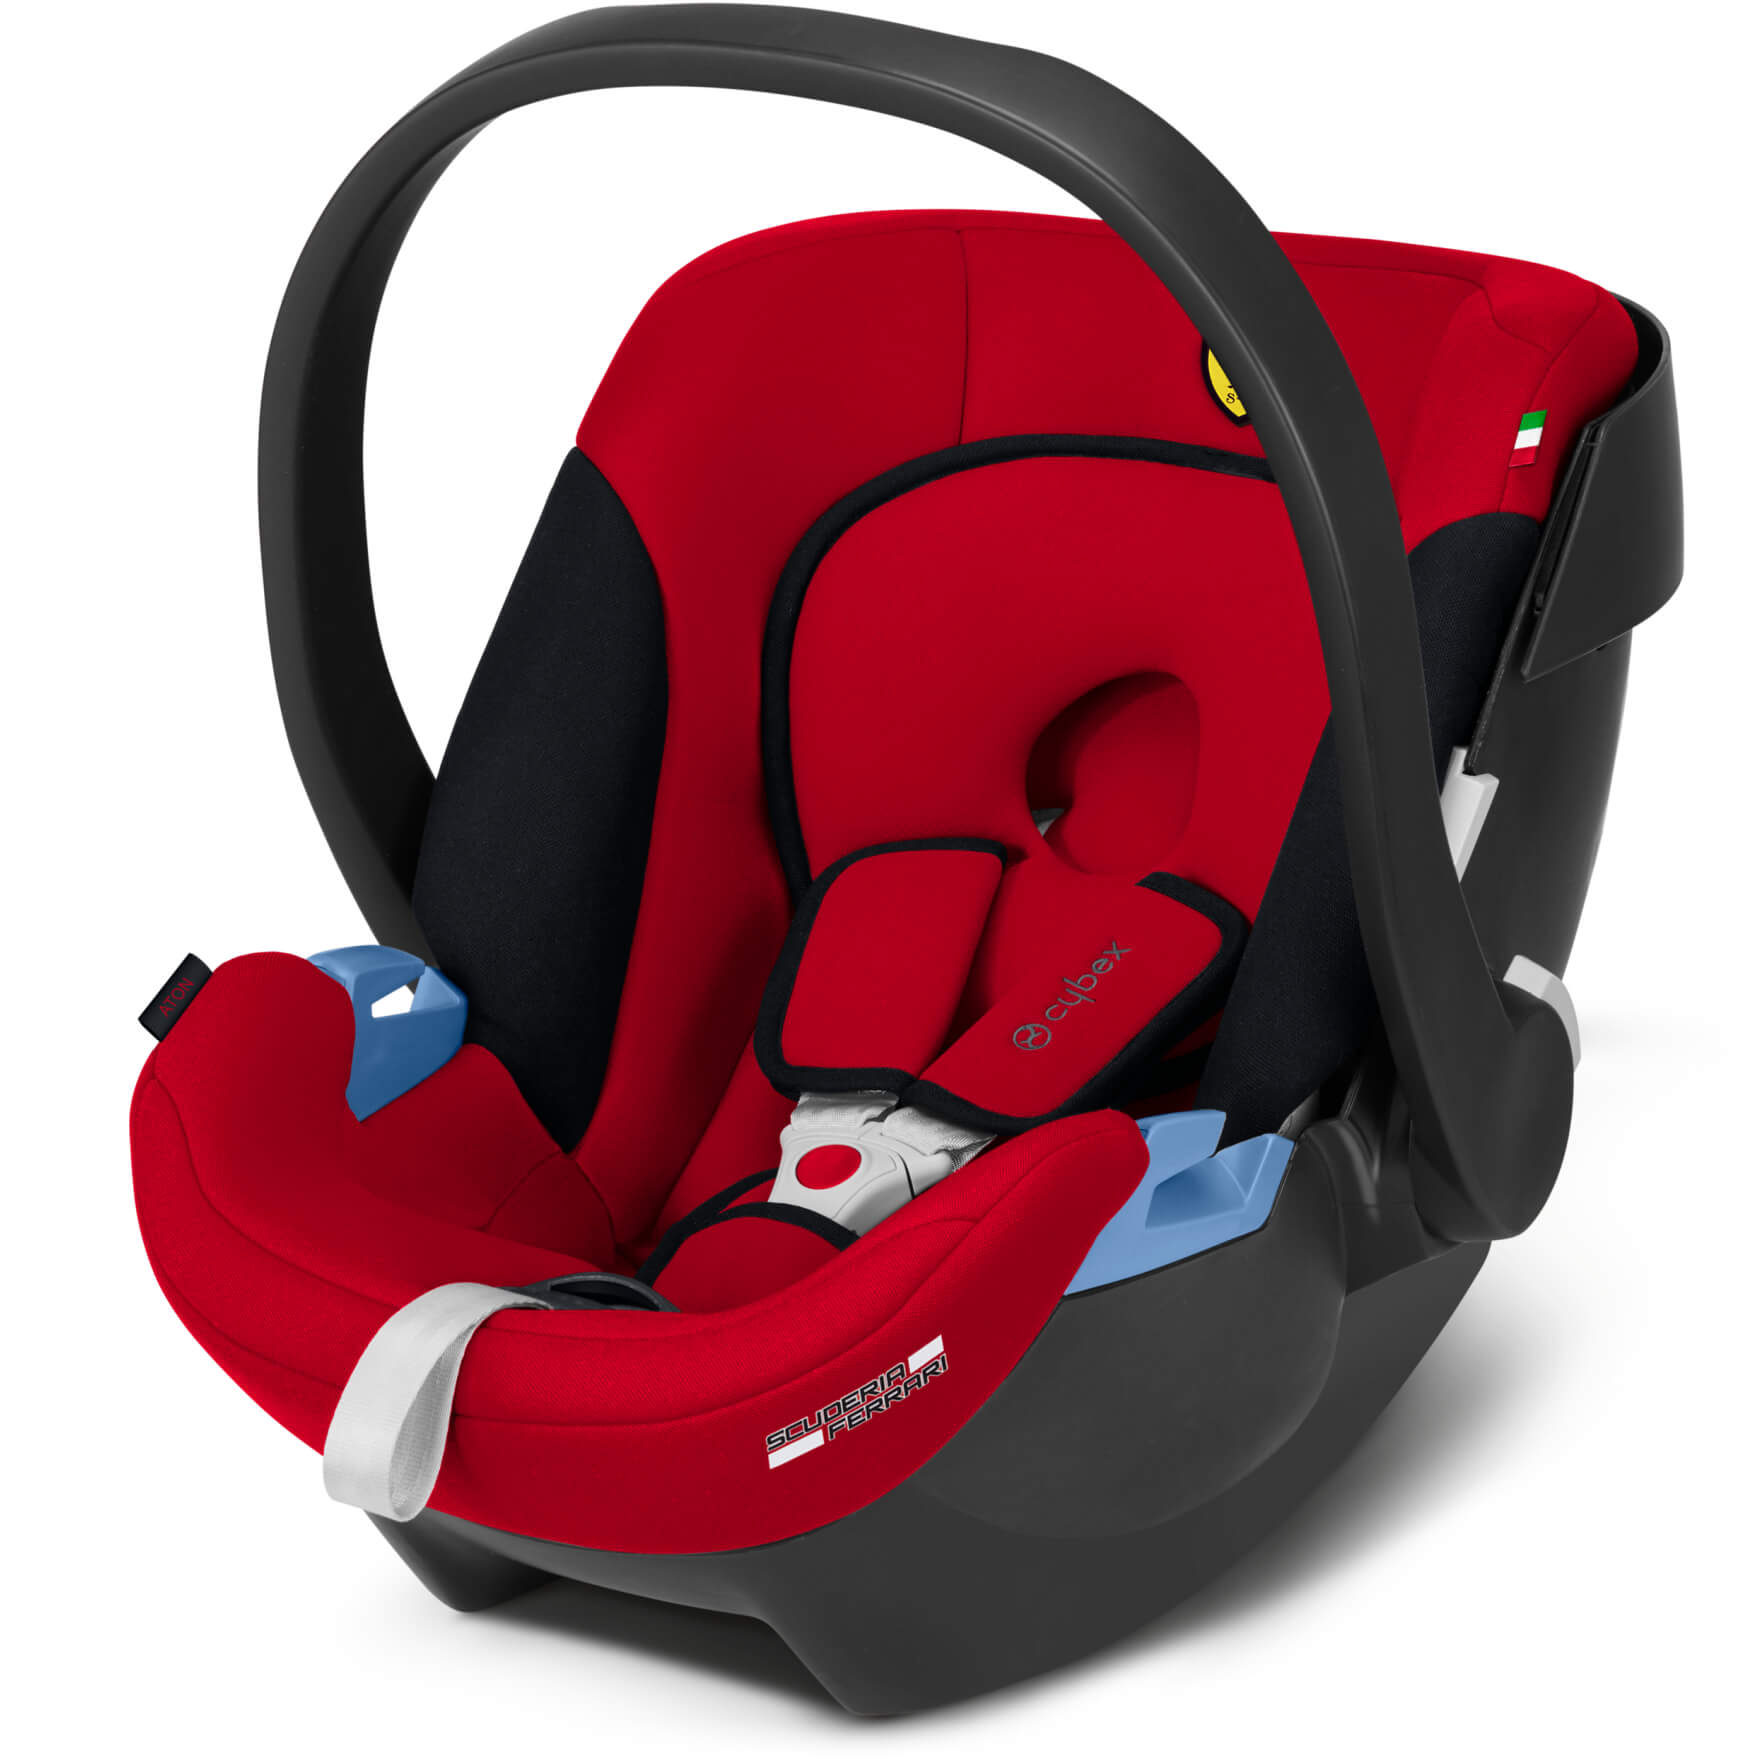 Cybex aton racing red scuderia ferrari edition infant carrier silver.15120a 20191124141742